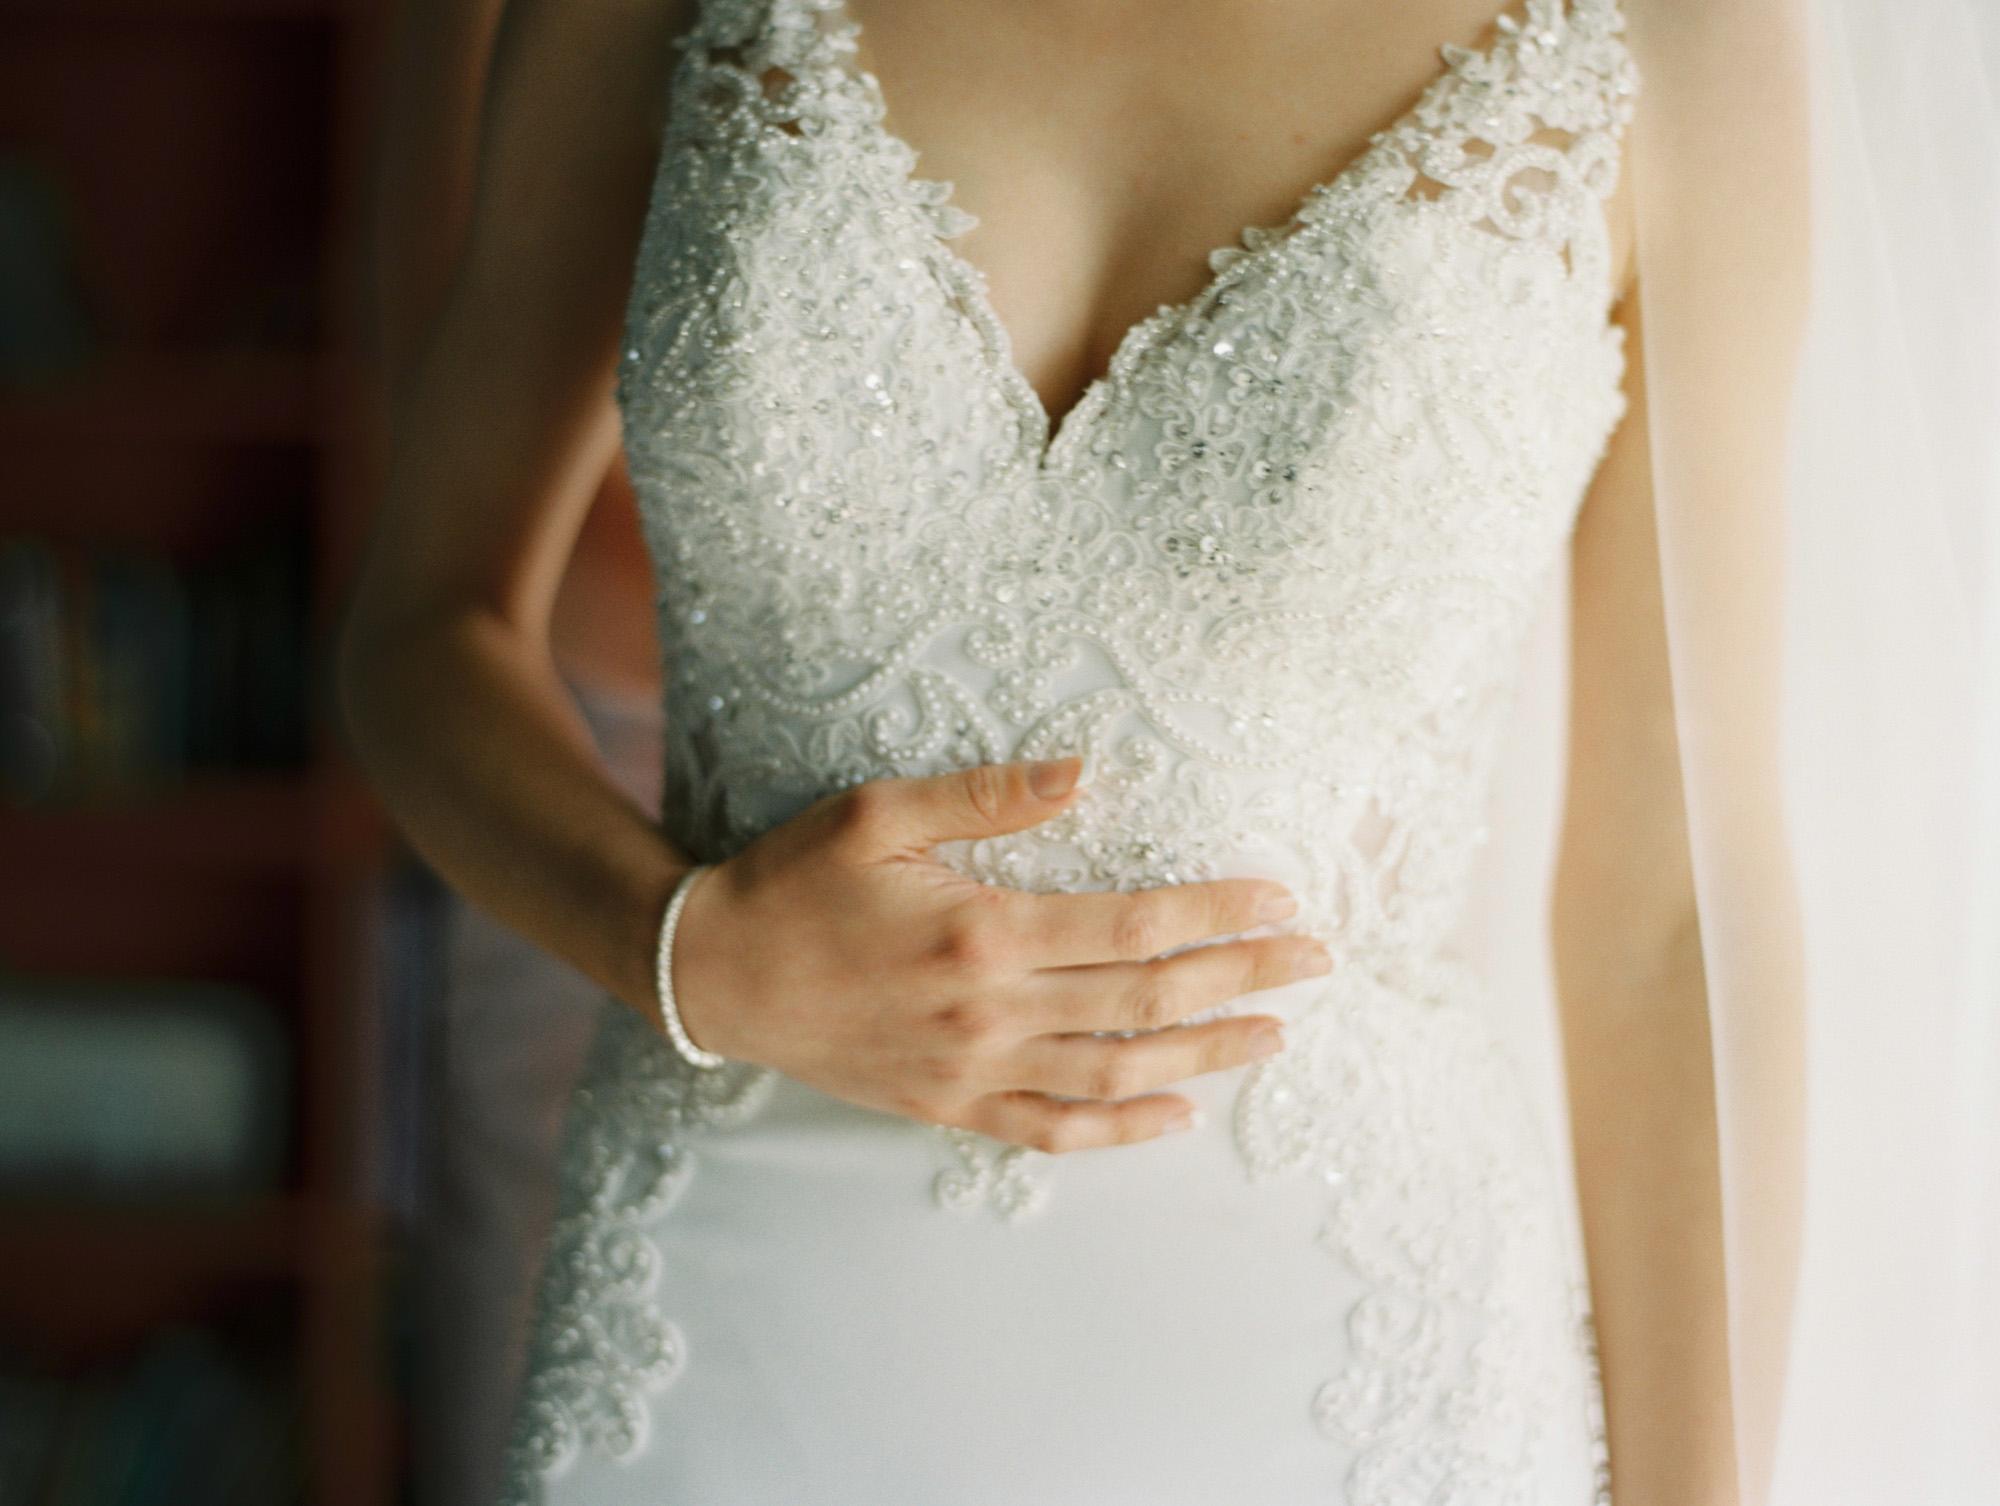 Mount-Lofty-House-wedding-photography-021.jpg